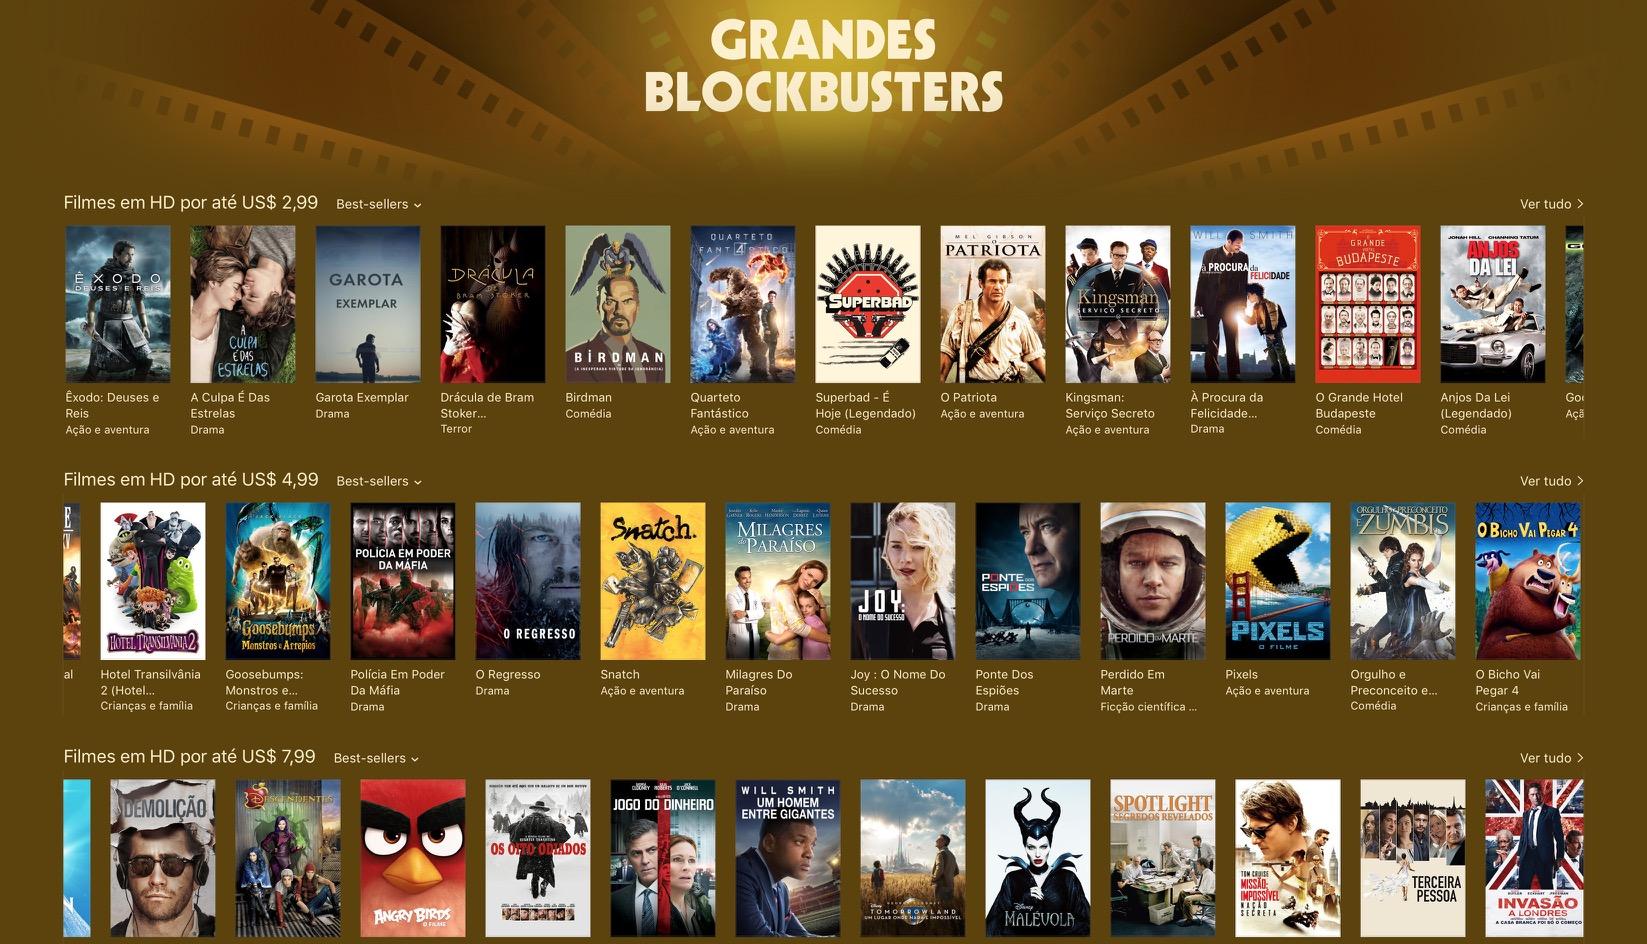 Grandes blockbusters - iTunes [Movie] Store